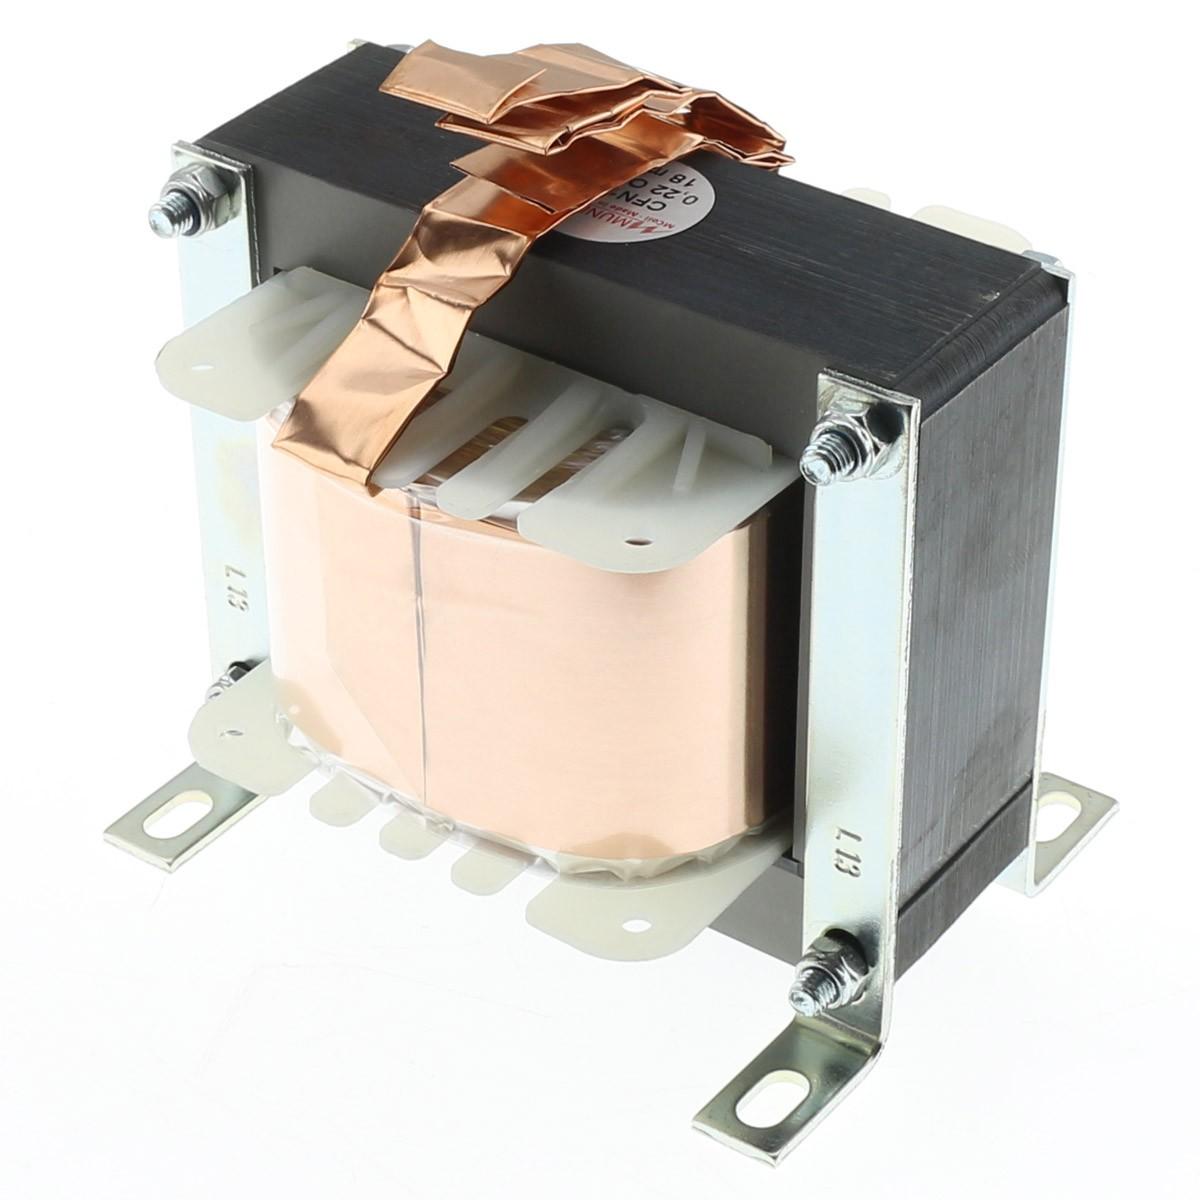 MUNDORF CFN14 FOIL COIL Bobine Cuivre Zero-Ohm Noyau Feron 5.6mH